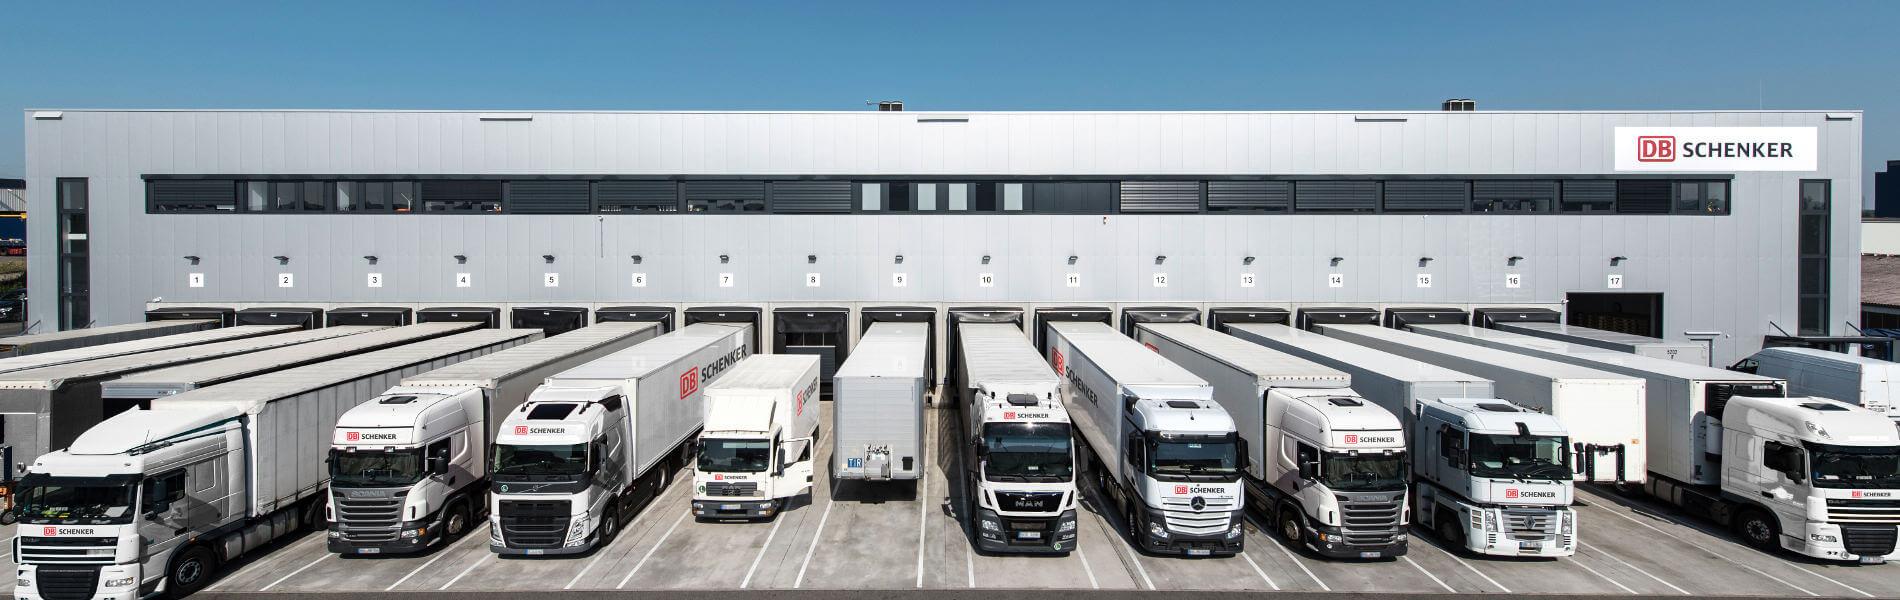 Logistics properties: 3 trends for logistics space